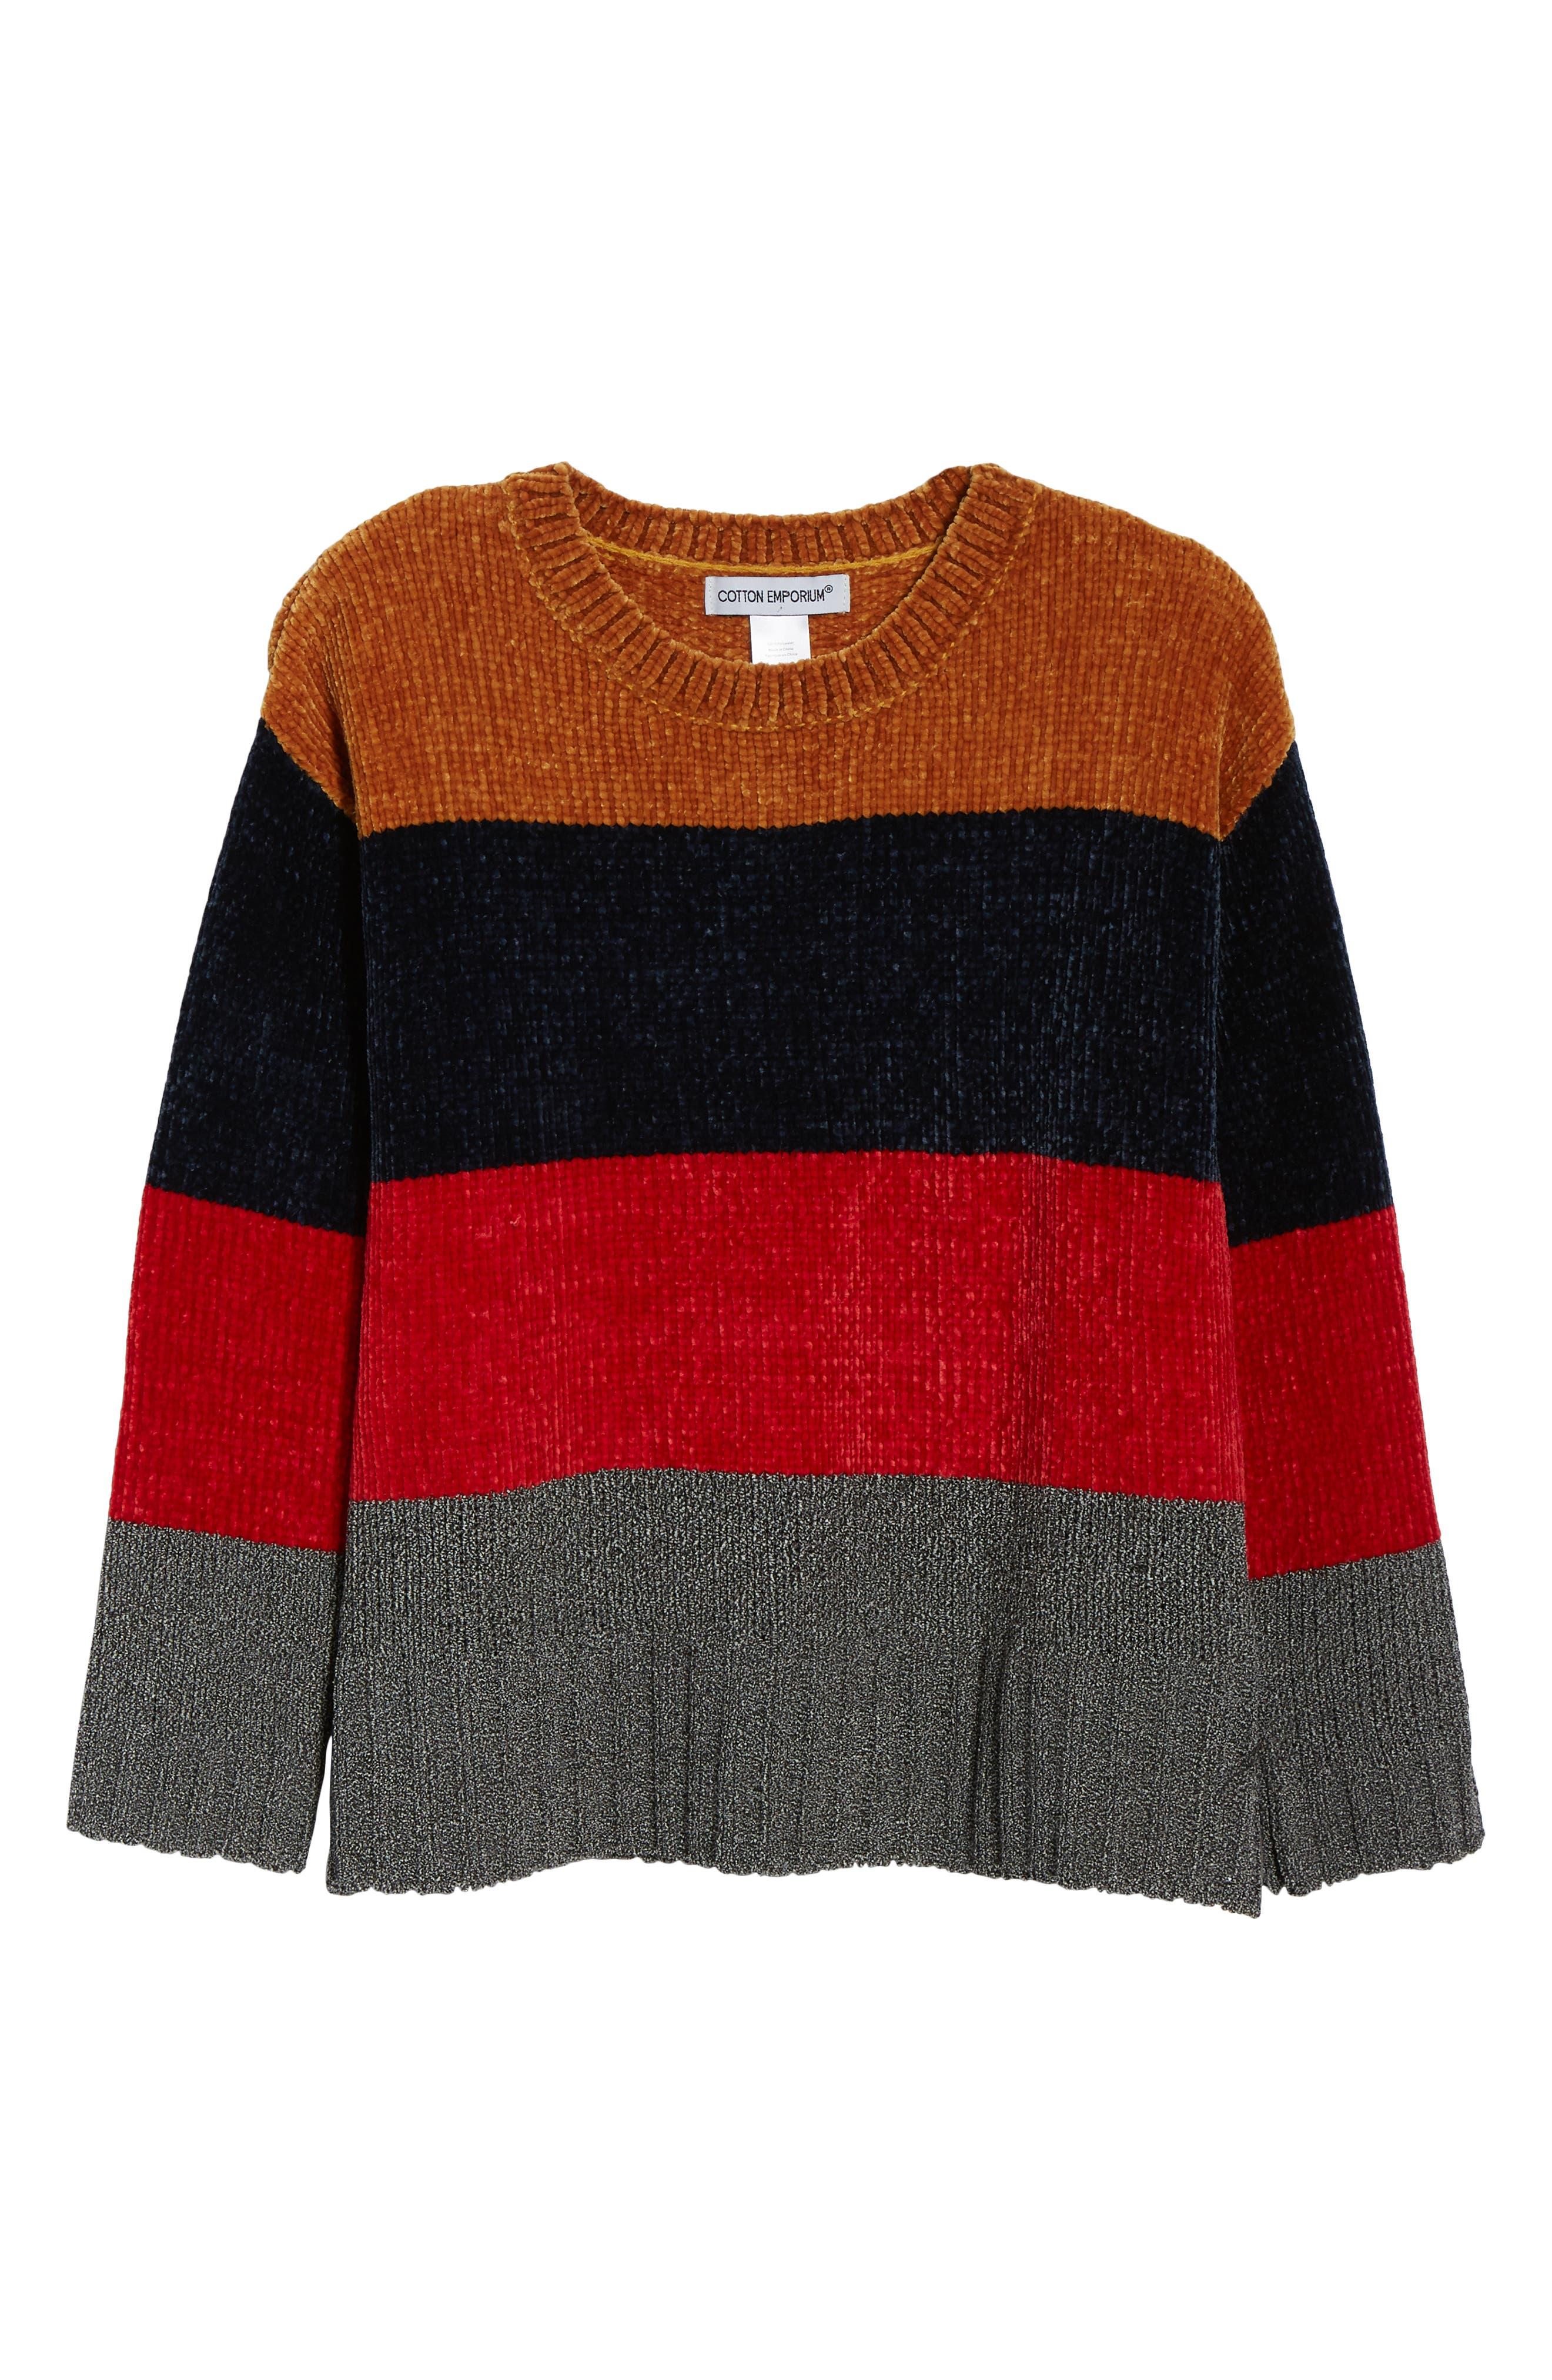 COTTON EMPORIUM,                             Stripe Chenille Sweater,                             Alternate thumbnail 6, color,                             710